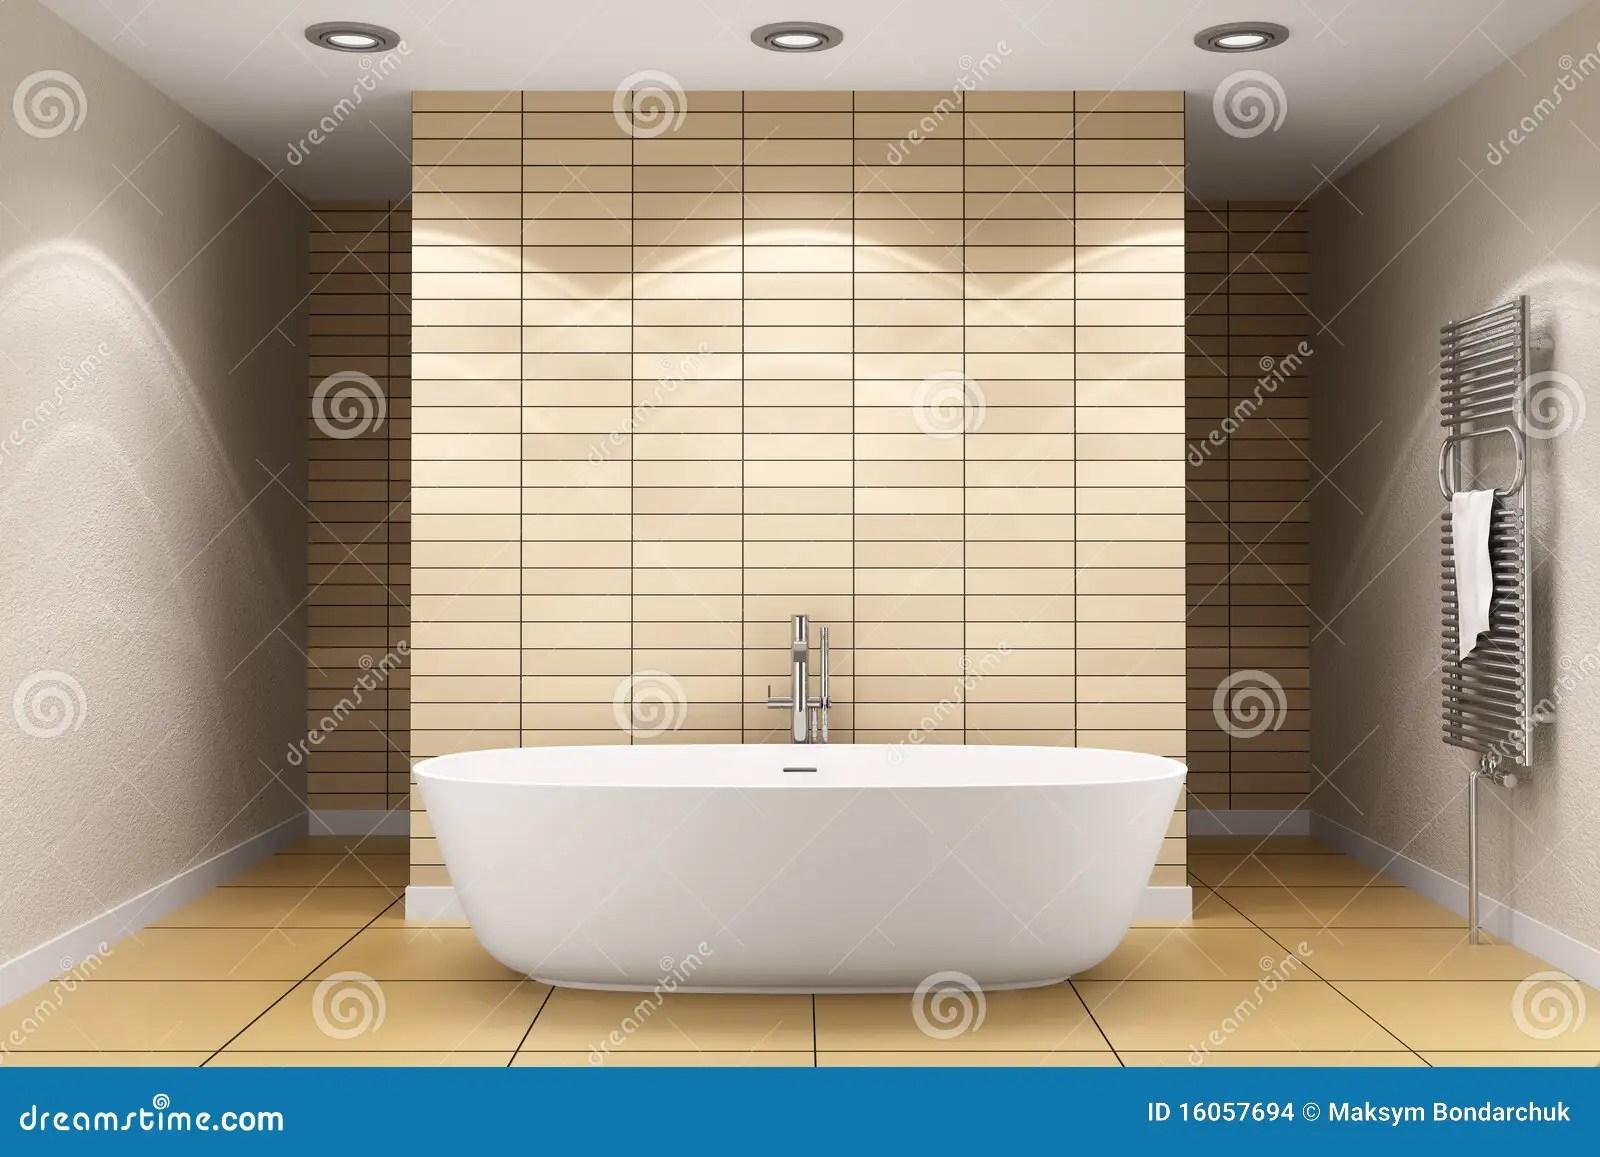 Modern Bathroom With Beige Tiles On Wall Stock Photo  Image of bathroom modern 16057694